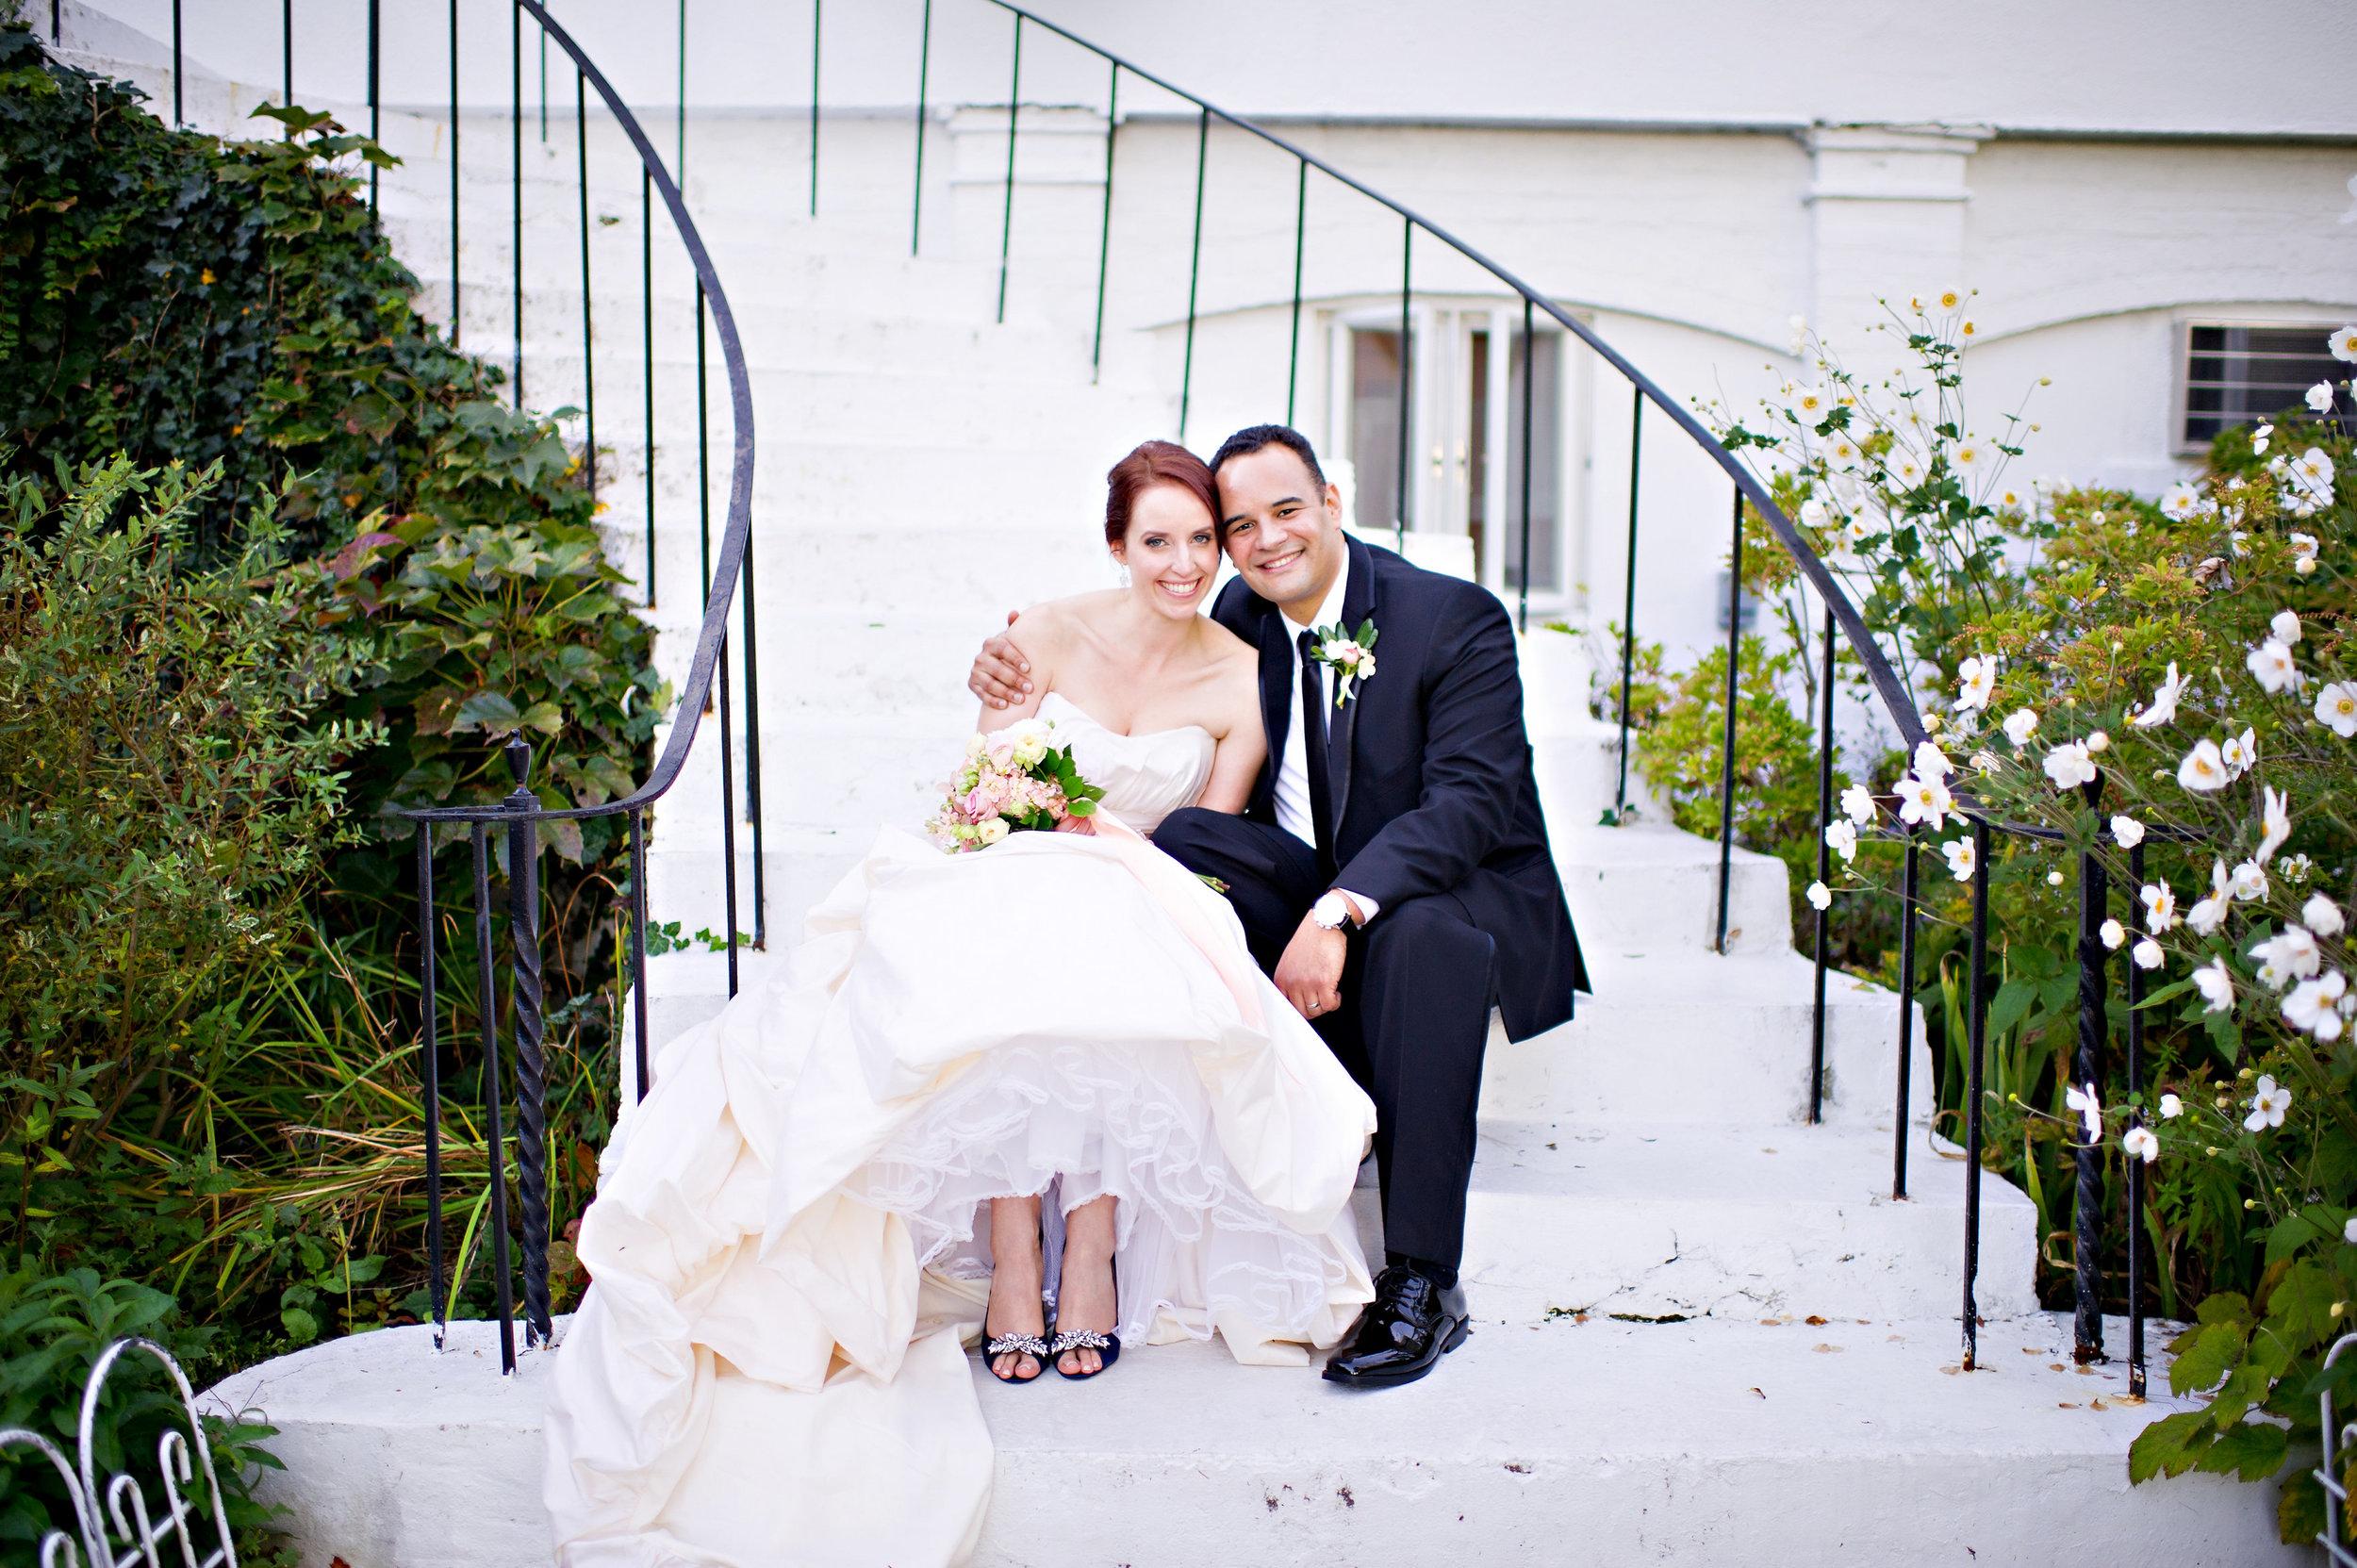 CT_Wedding_Planner_Crabtree_Kittle_House035.jpg